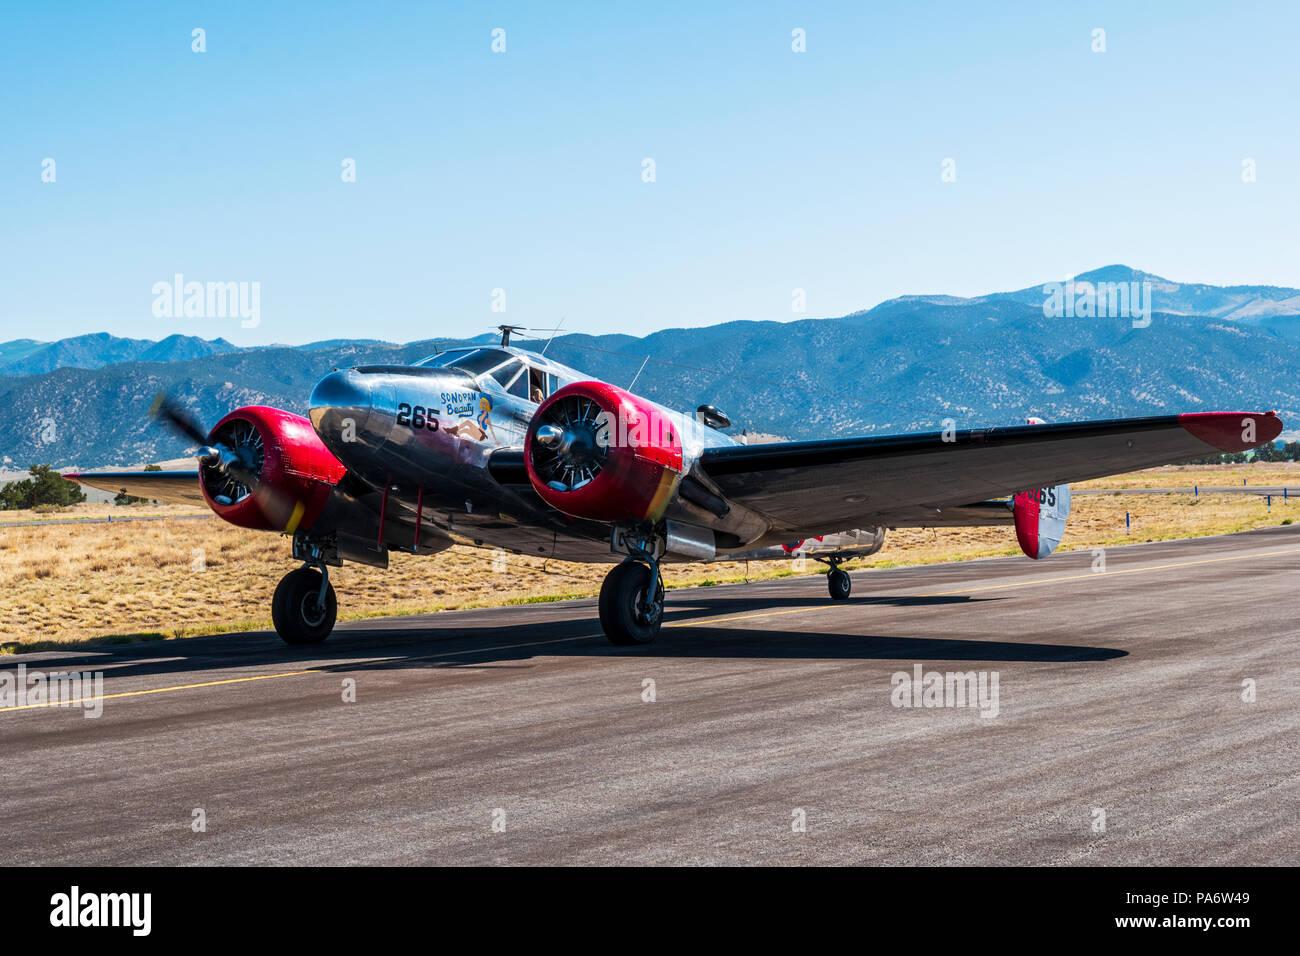 Beechcraft Model 18; Twin Beech; UC-45J Navigator; SNB-1 Kansan; US Navy; Salida Fly-in & Air Show; Salida; Colorado; USA - Stock Image